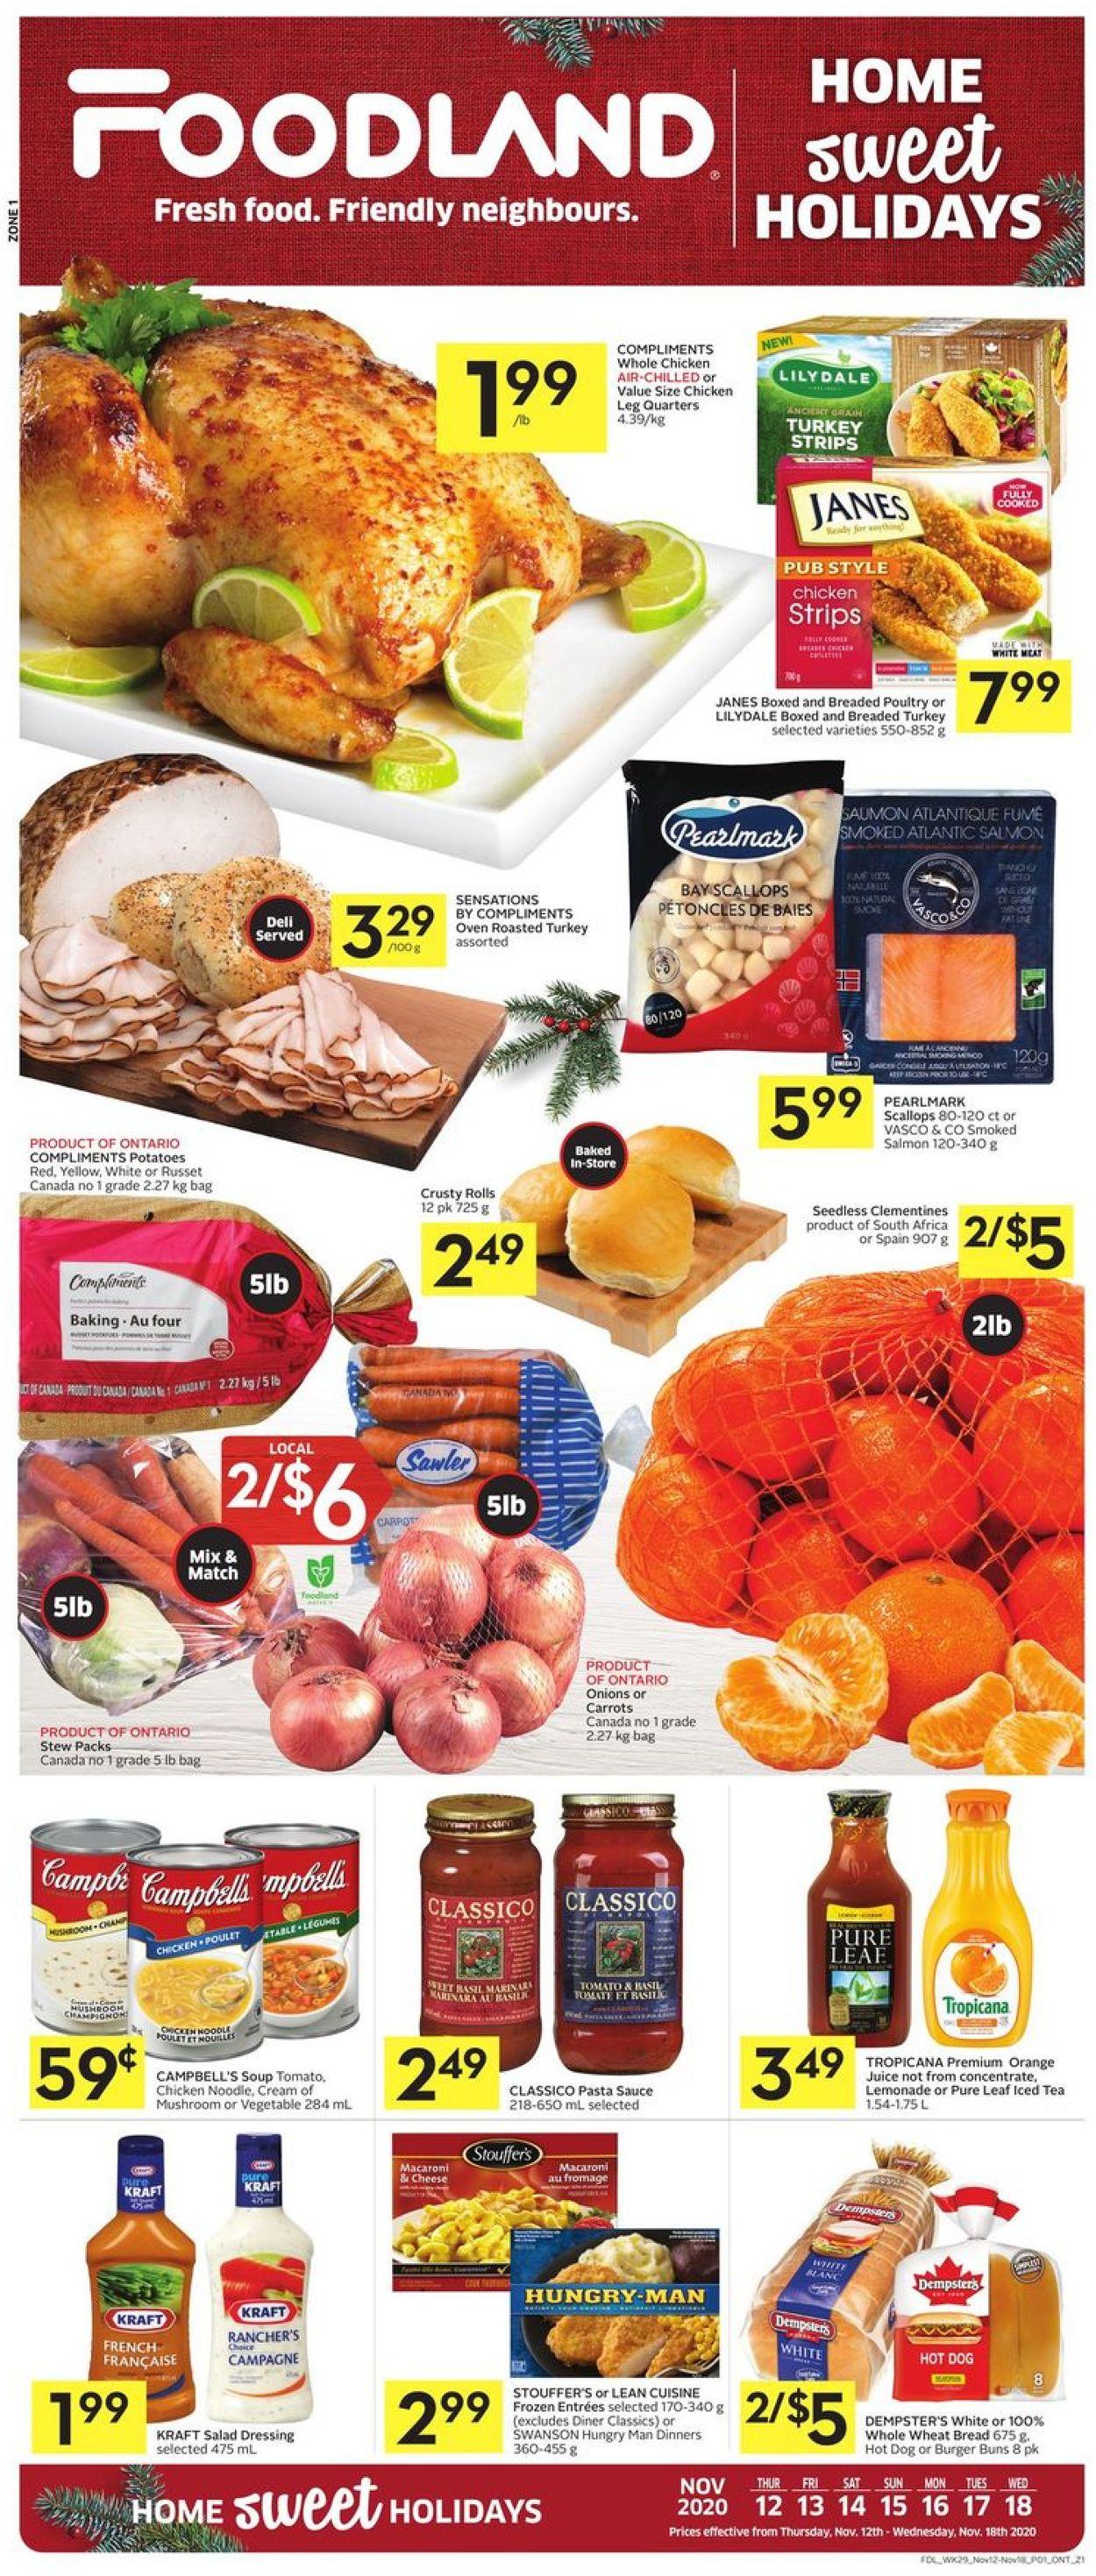 Foodland - Holidays 2020 Flyer - 11/12-11/18/2020